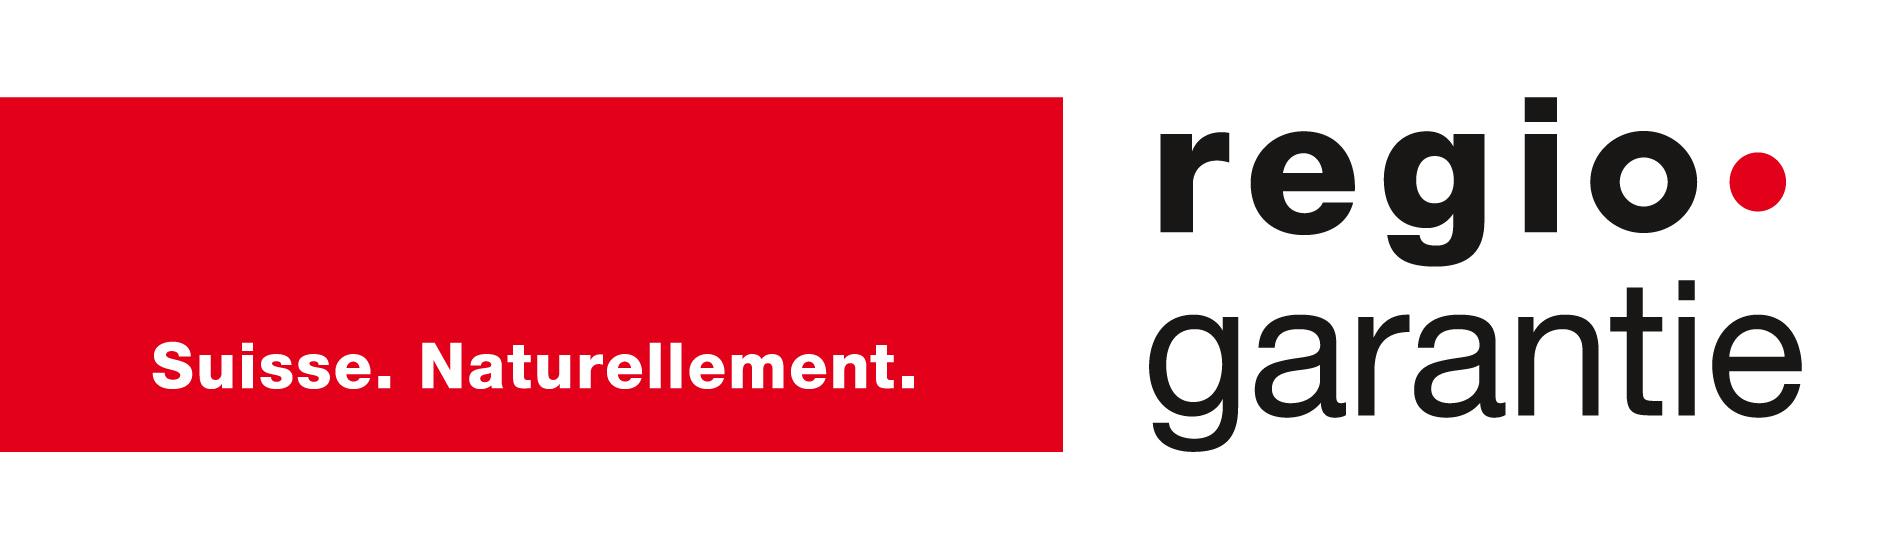 Suisse-naturellement-regio-garantie.jpg